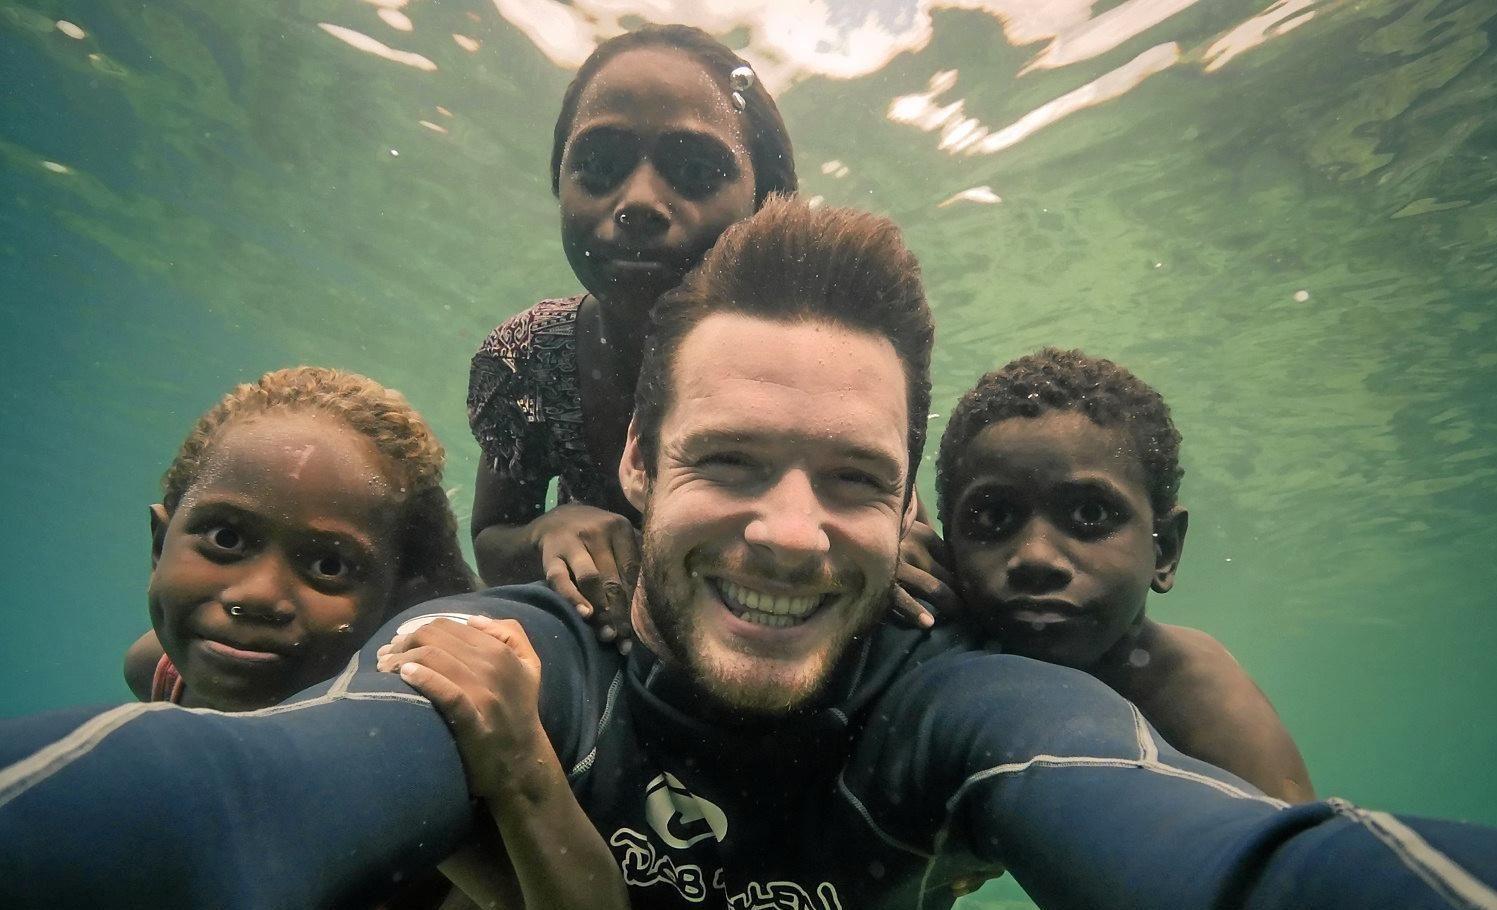 Marine biologist Lucas Handley takes an underwater selfie with children in the Solomon Islands. He stars in the movie Blue.